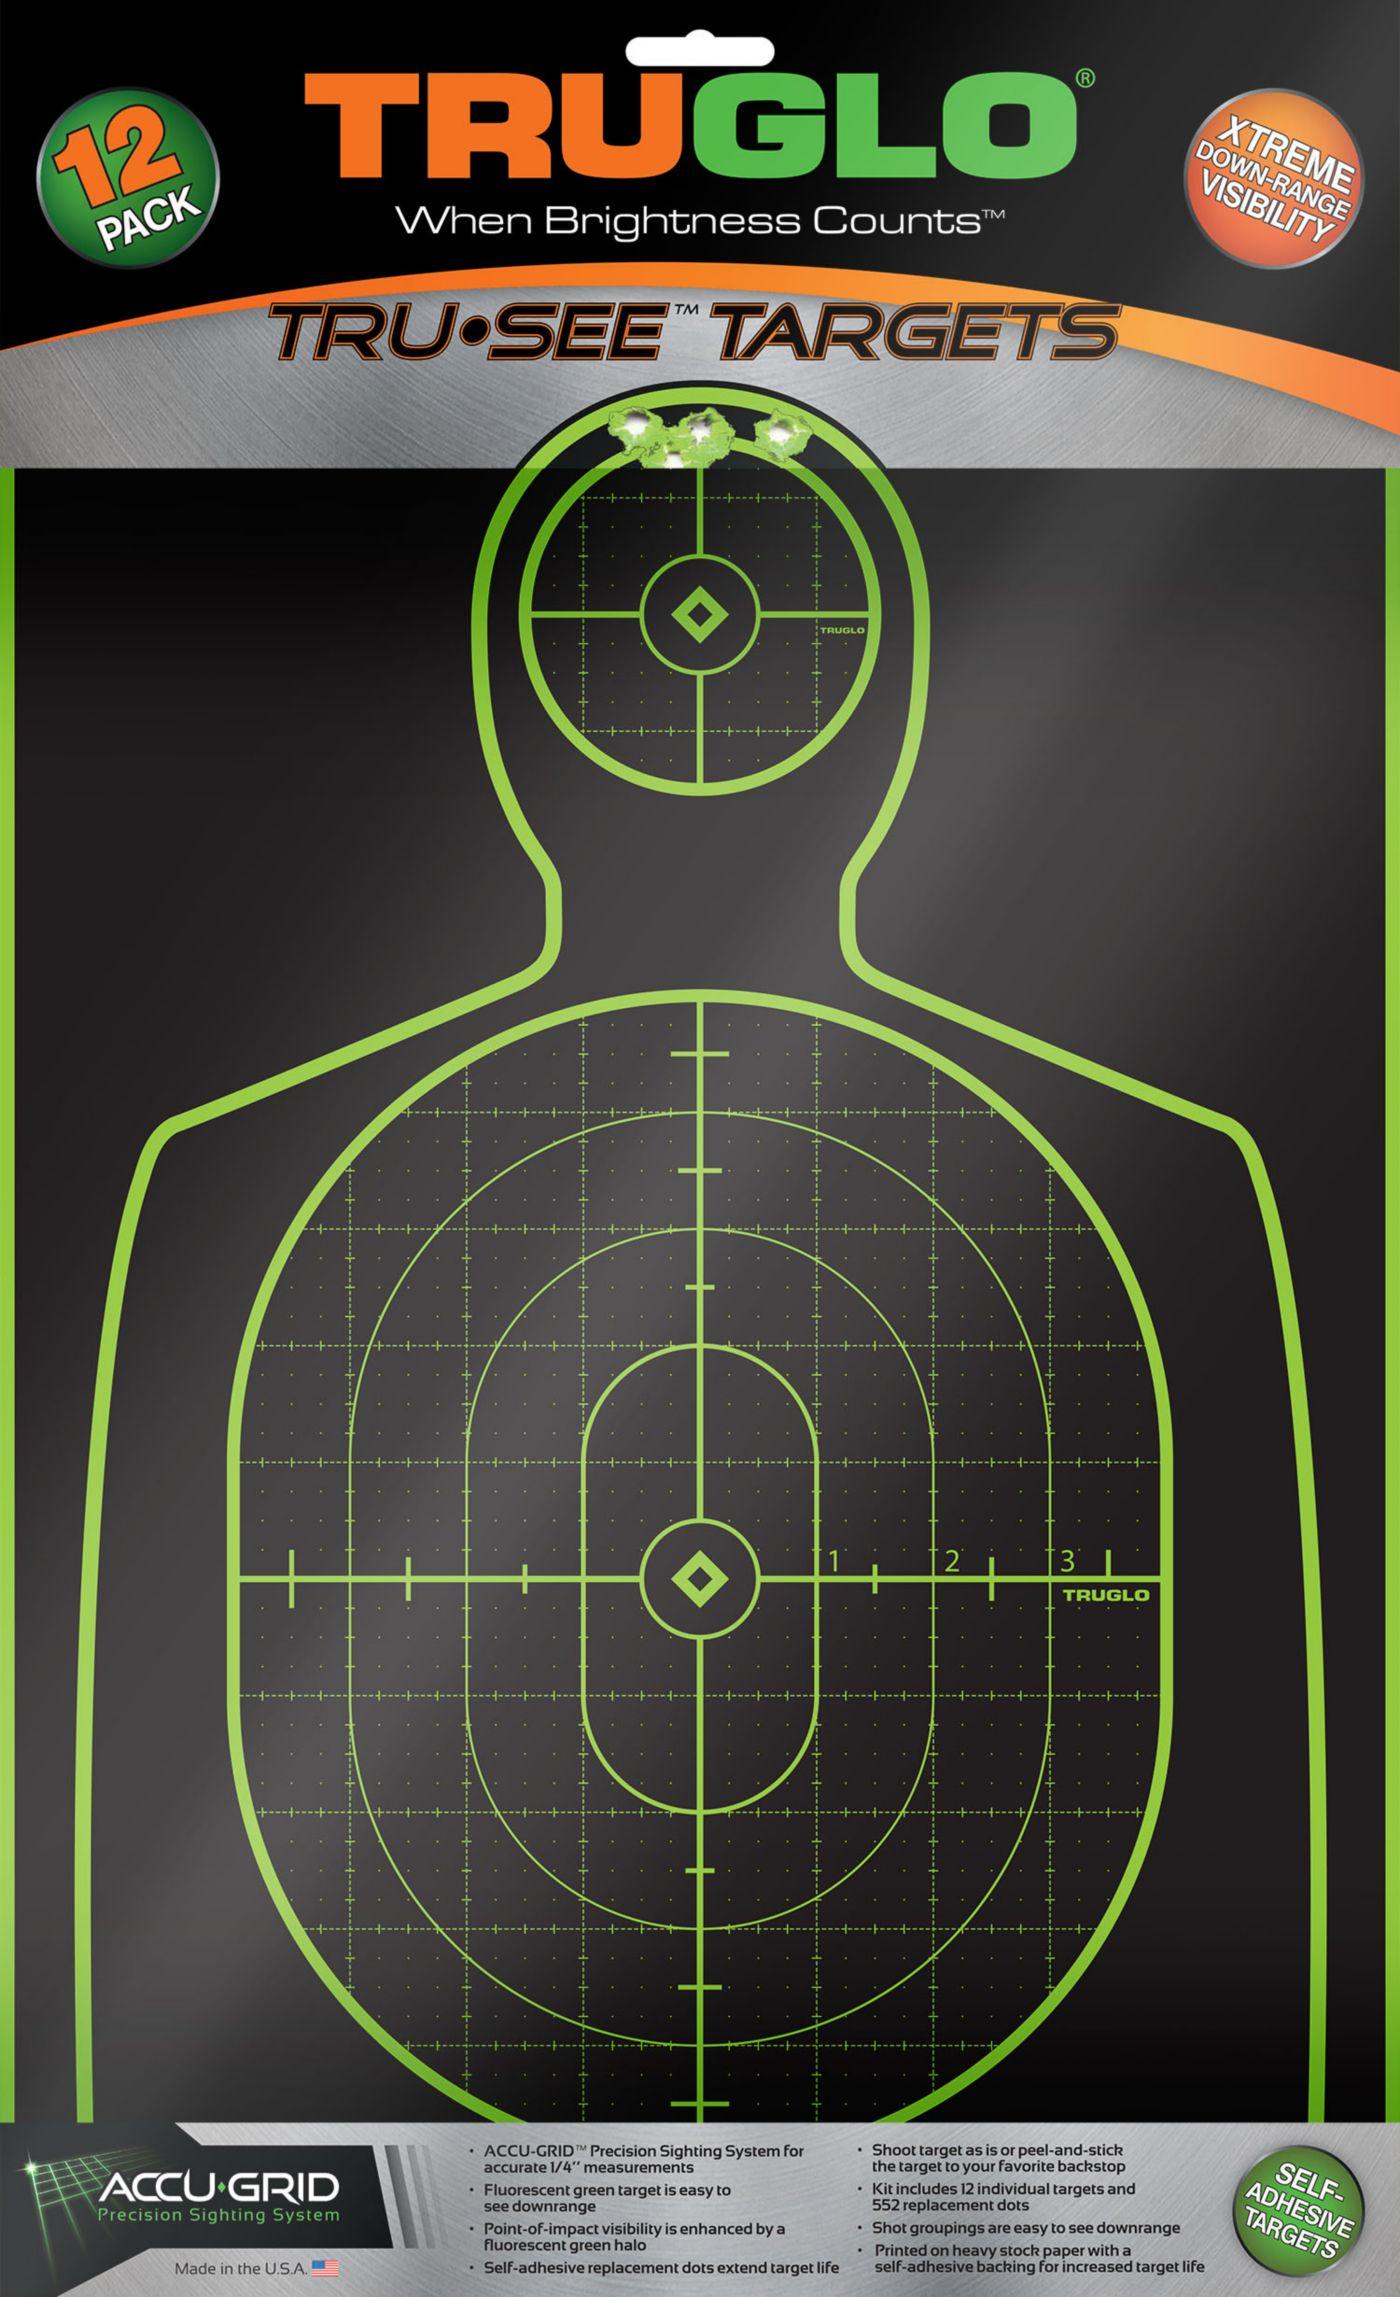 TRUGLO Tru-See Splatter Handgun Target – 12 Pack